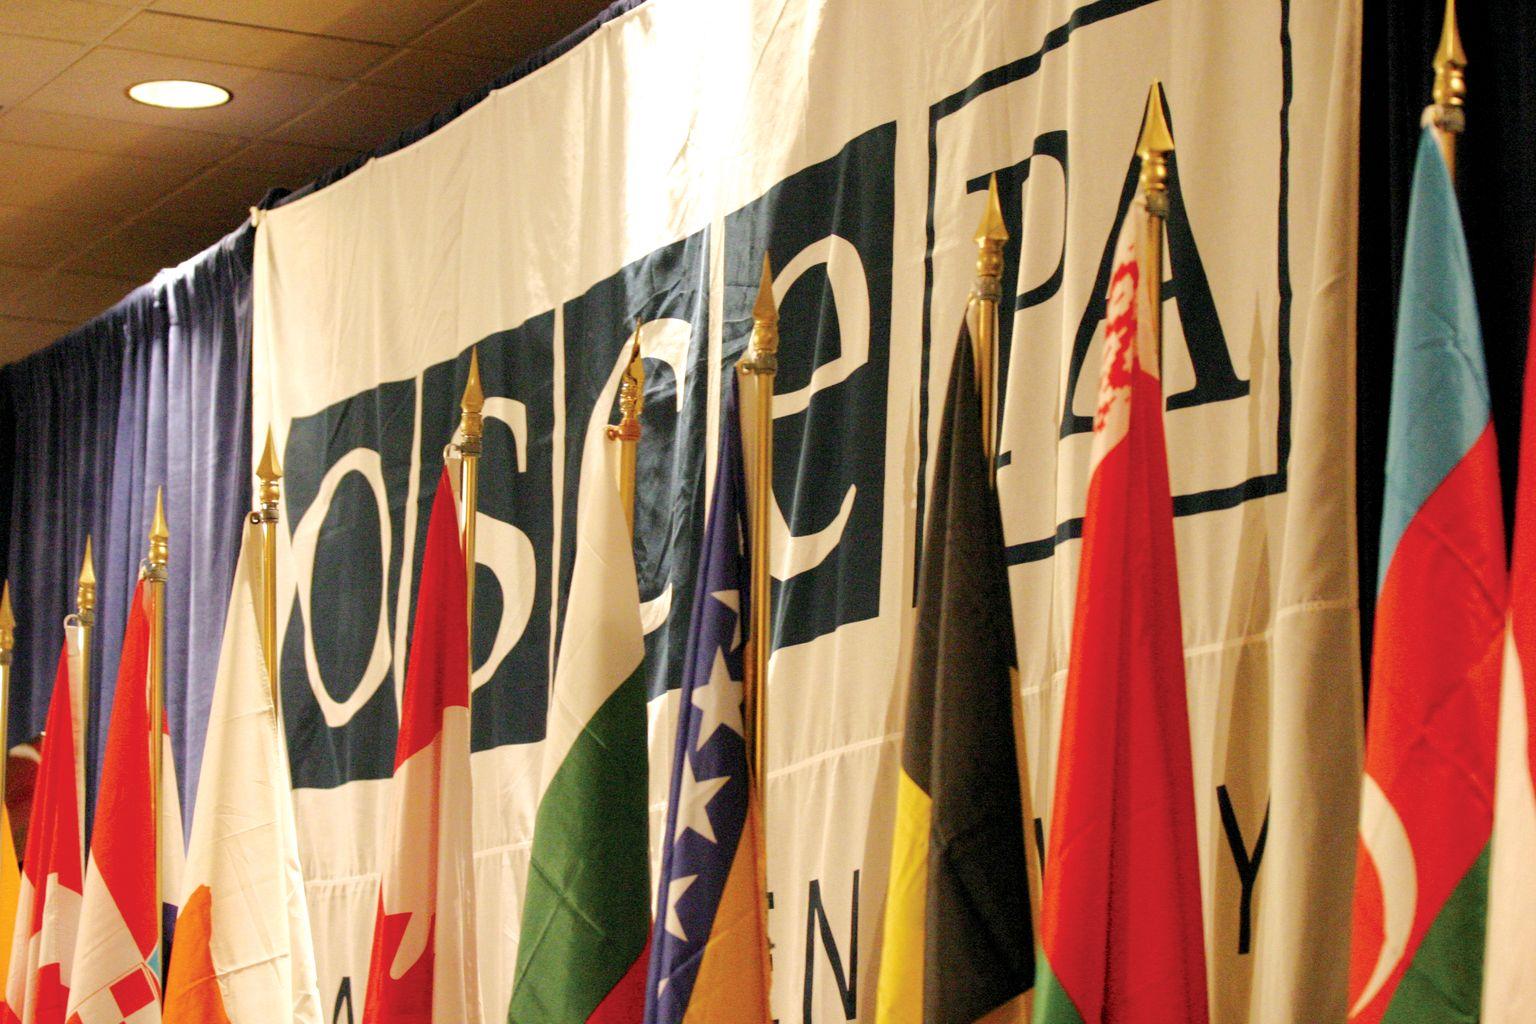 http://www.geopolintelligence.com/wp-content/uploads/2015/06/OSCE.jpg